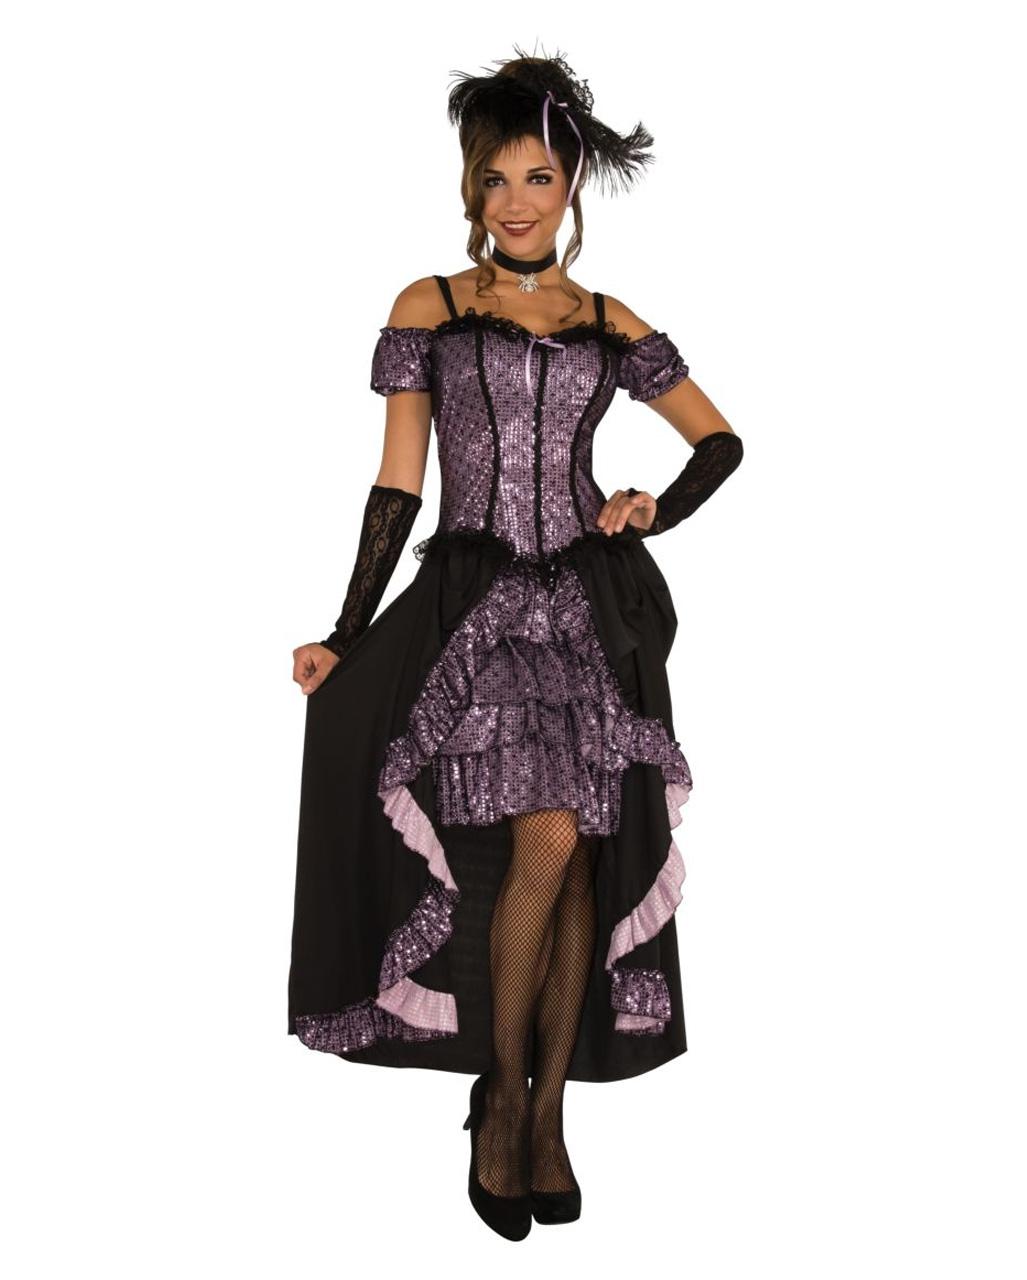 Dance Hall Mistress Burlesque Costume To Buy